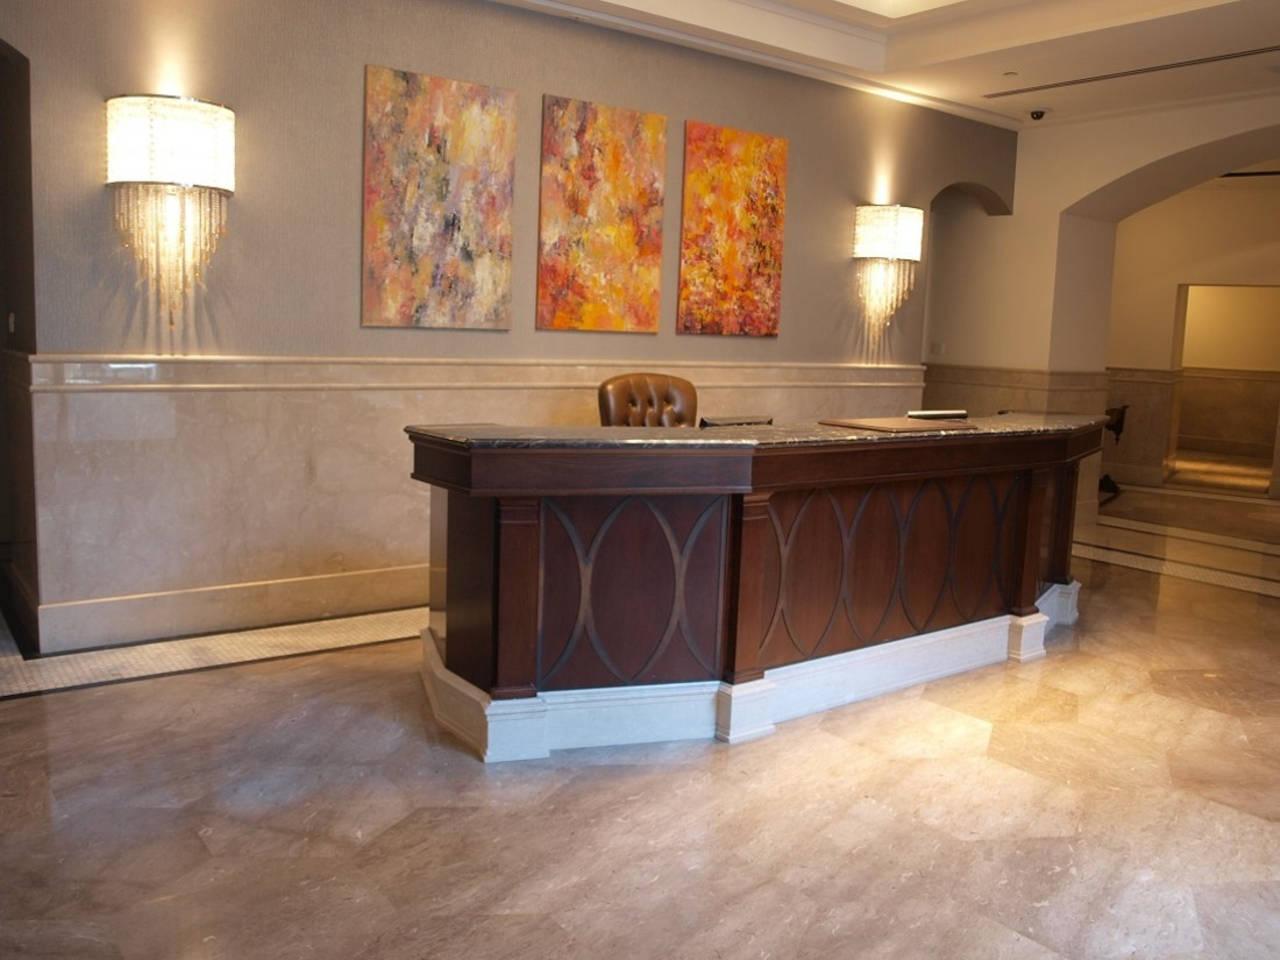 Apartment Great Location - Mamilla Mall Super Luxurious Flat photo 16587128